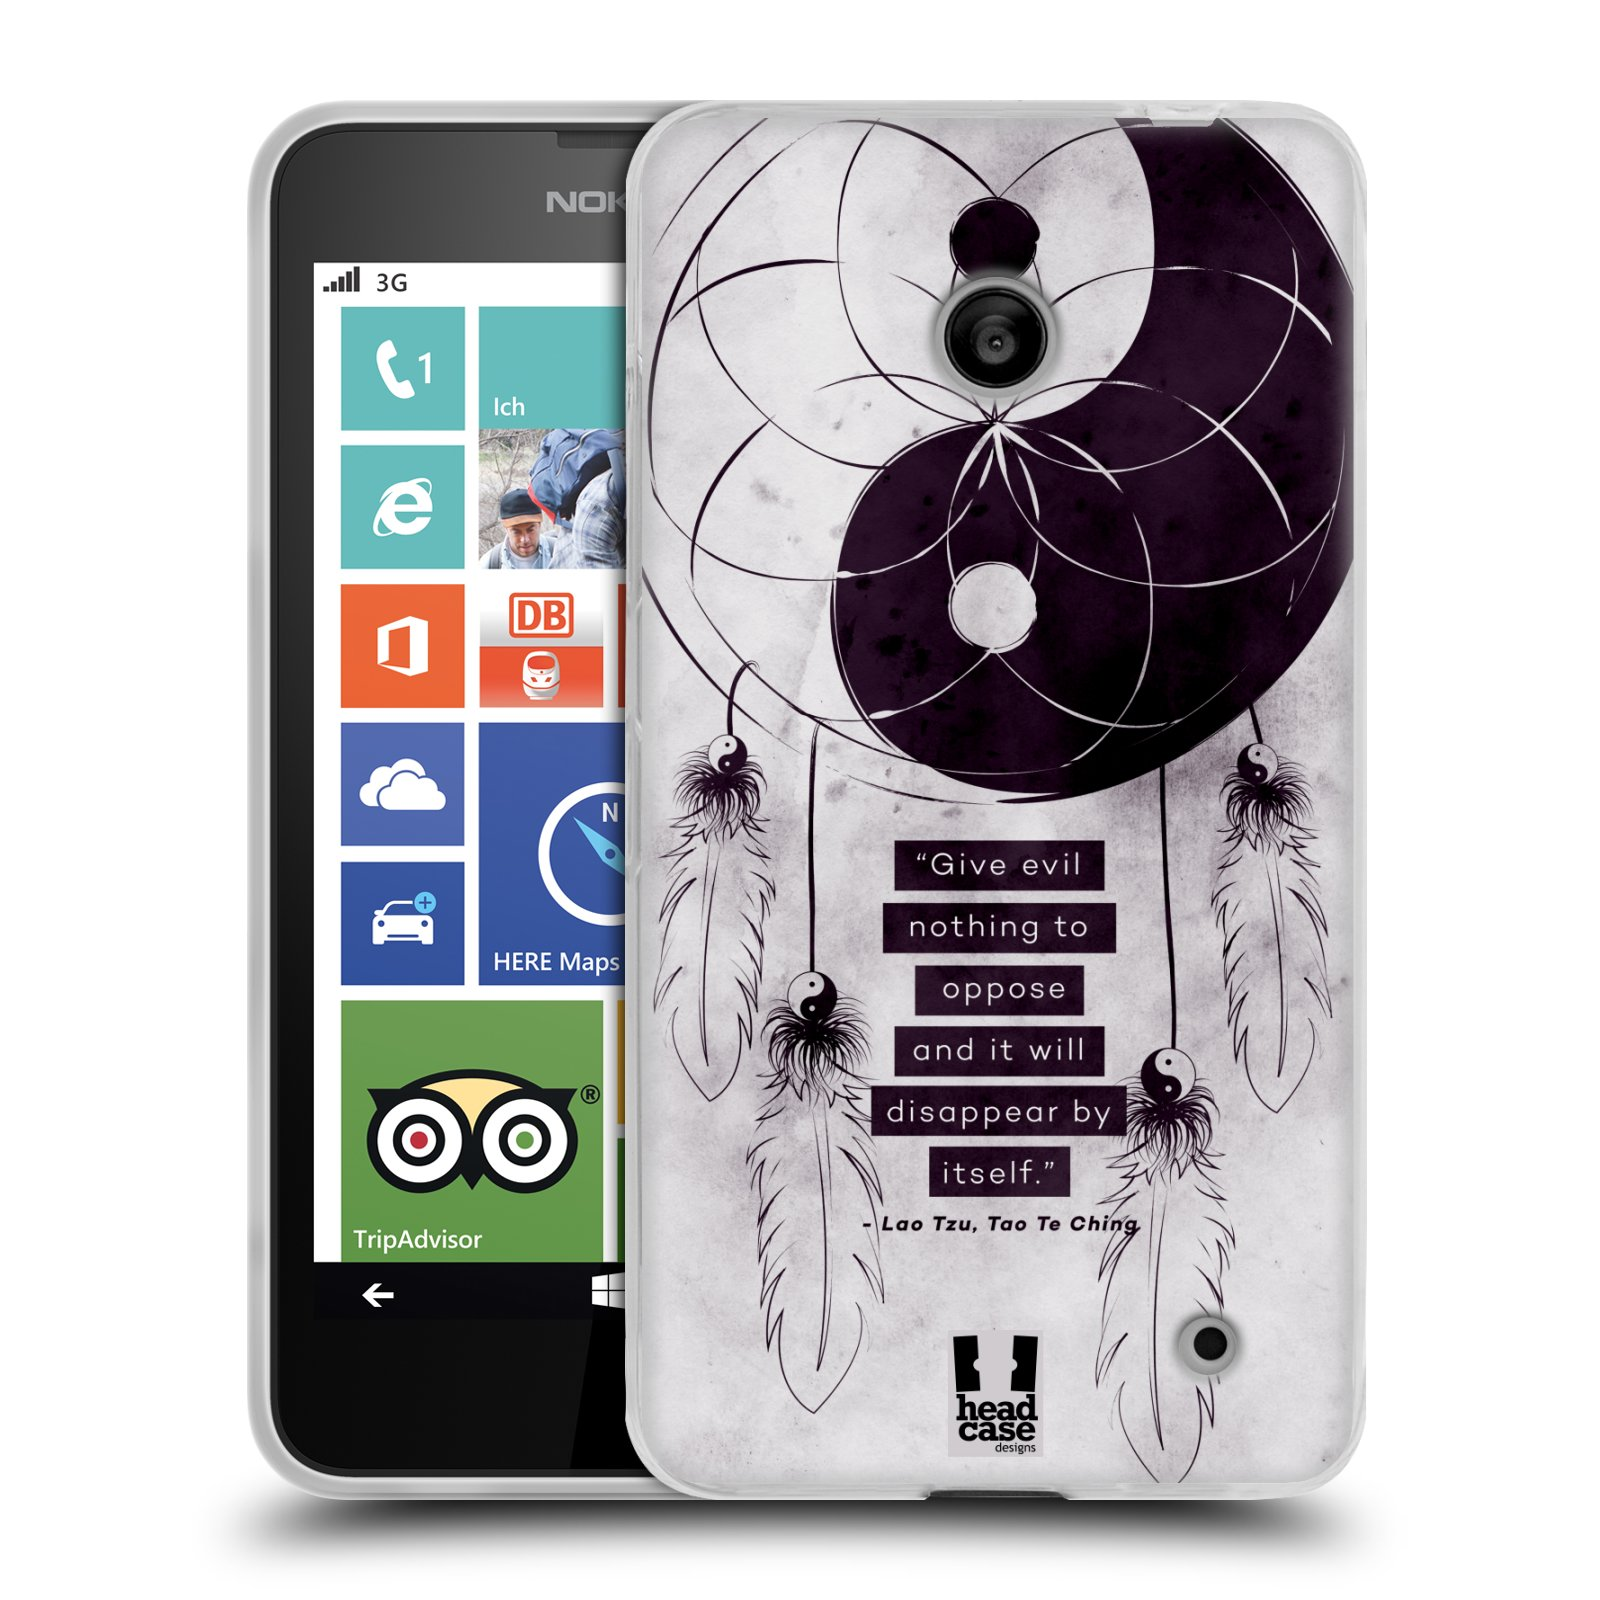 Silikonové pouzdro na mobil Nokia Lumia 635 HEAD CASE YIn a Yang CATCHER (Silikonový kryt či obal na mobilní telefon Nokia Lumia 635 Dual SIM)